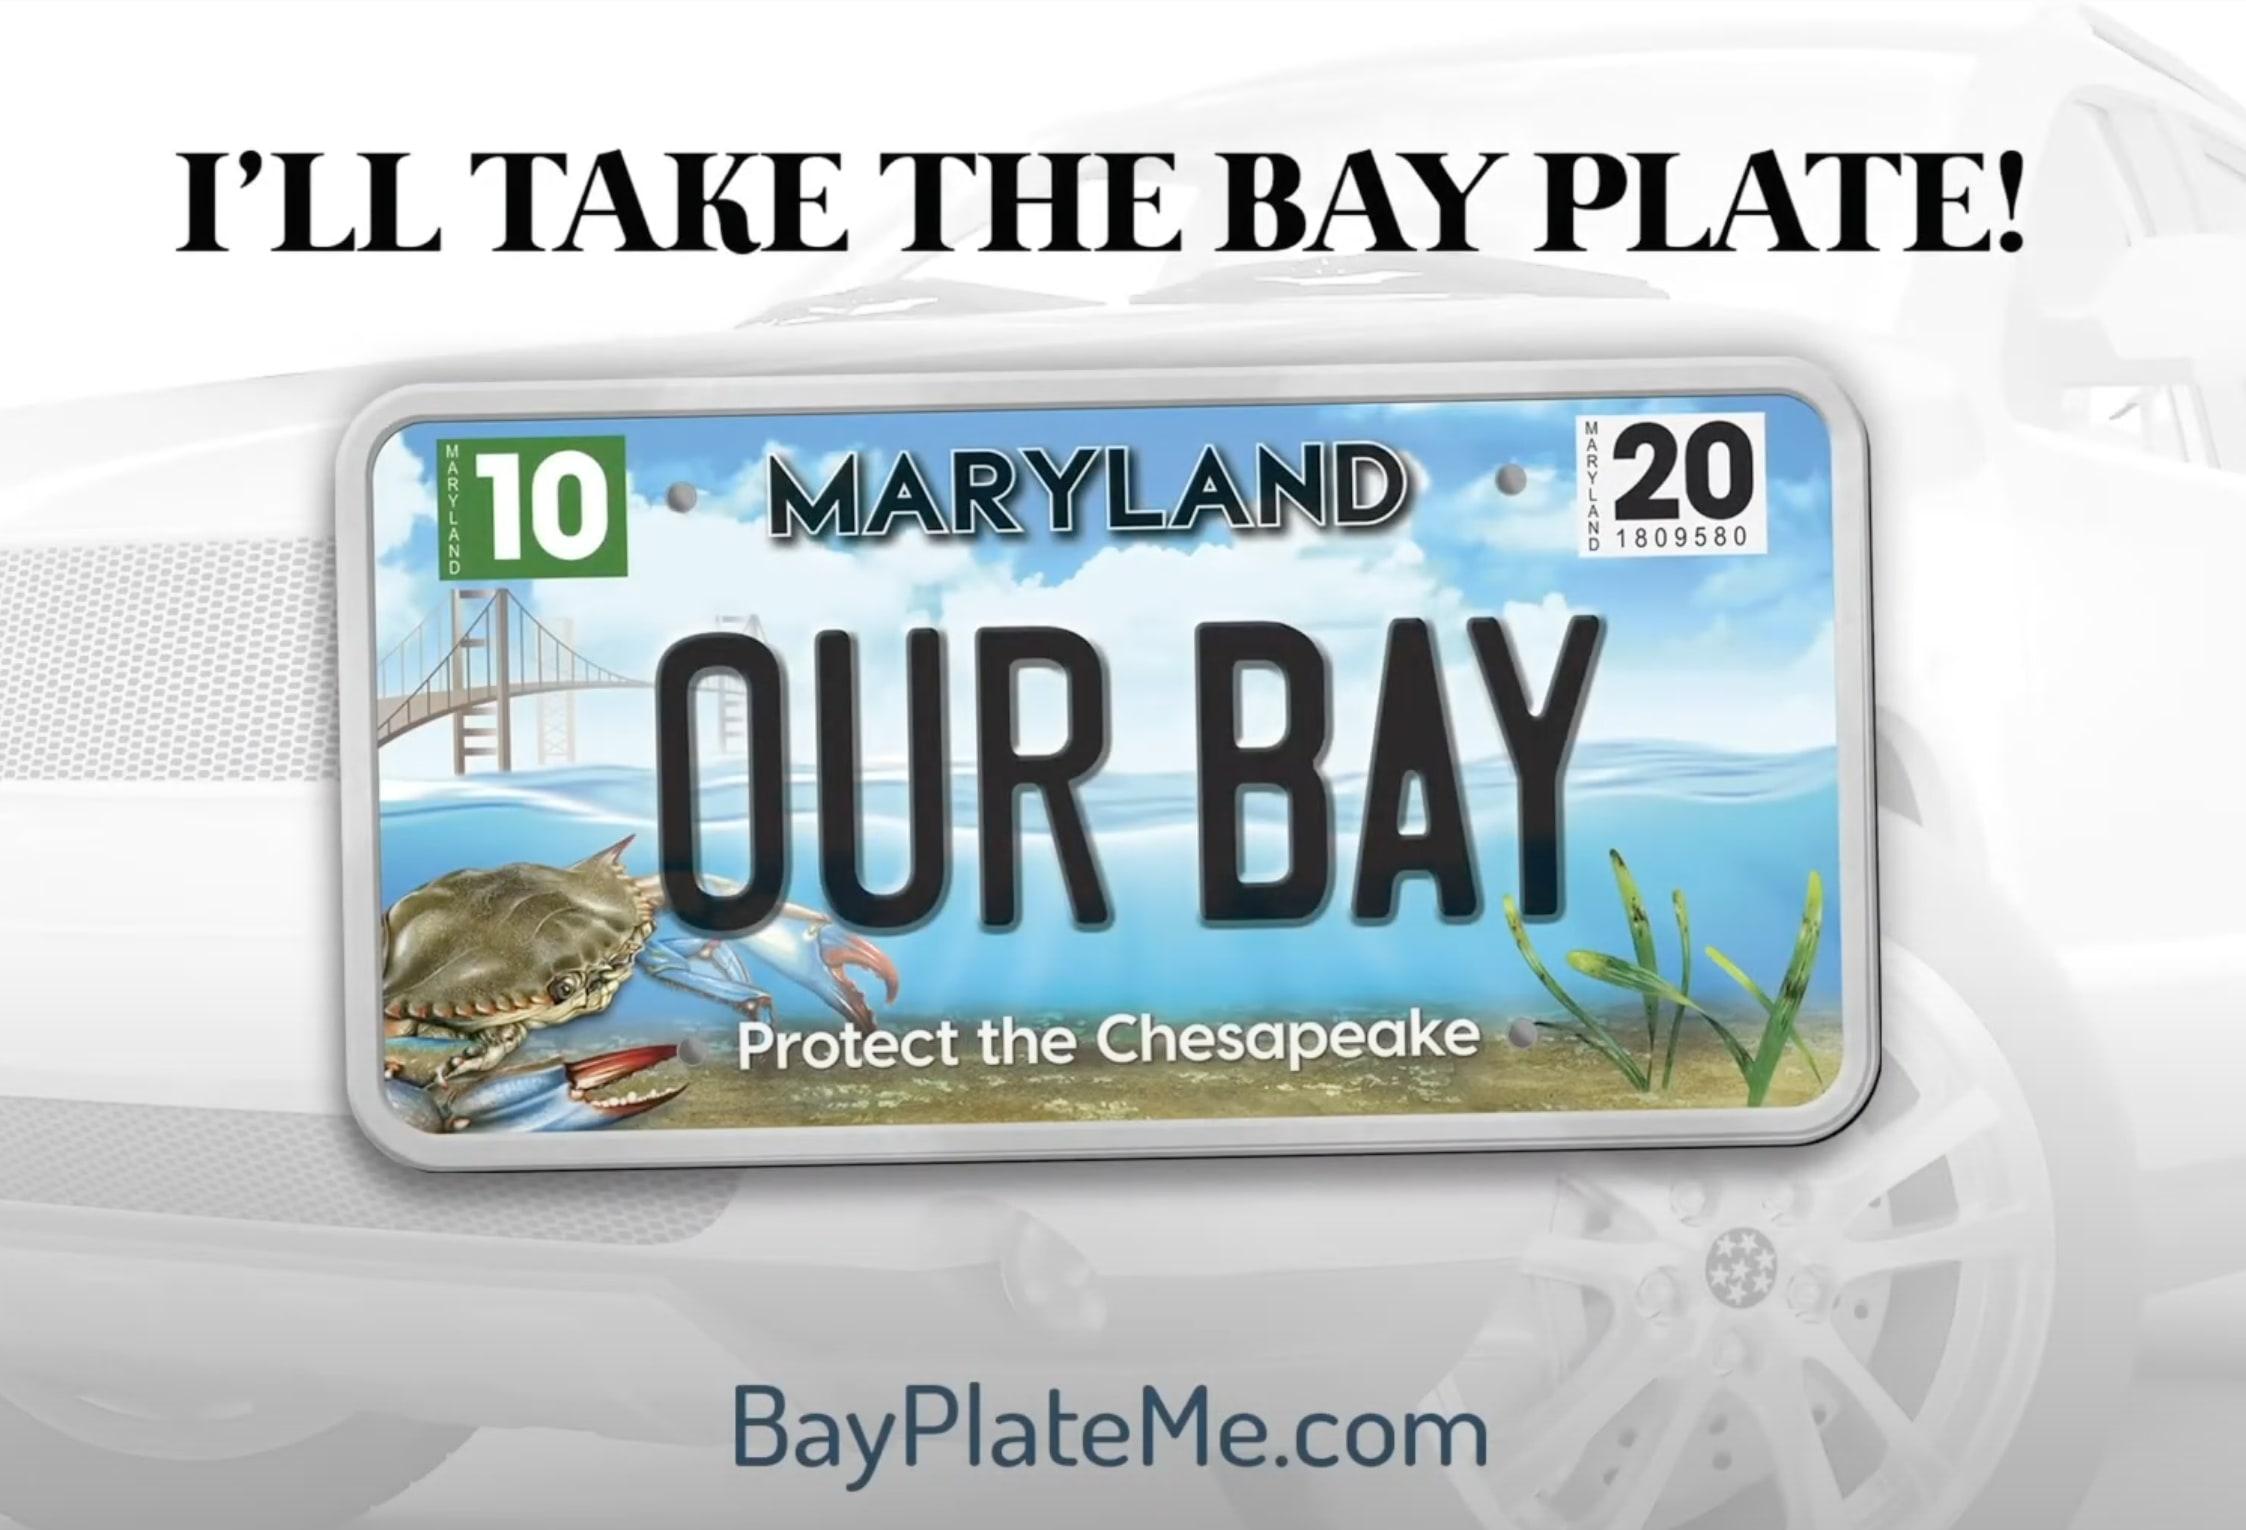 Chesapeake Bay Trust